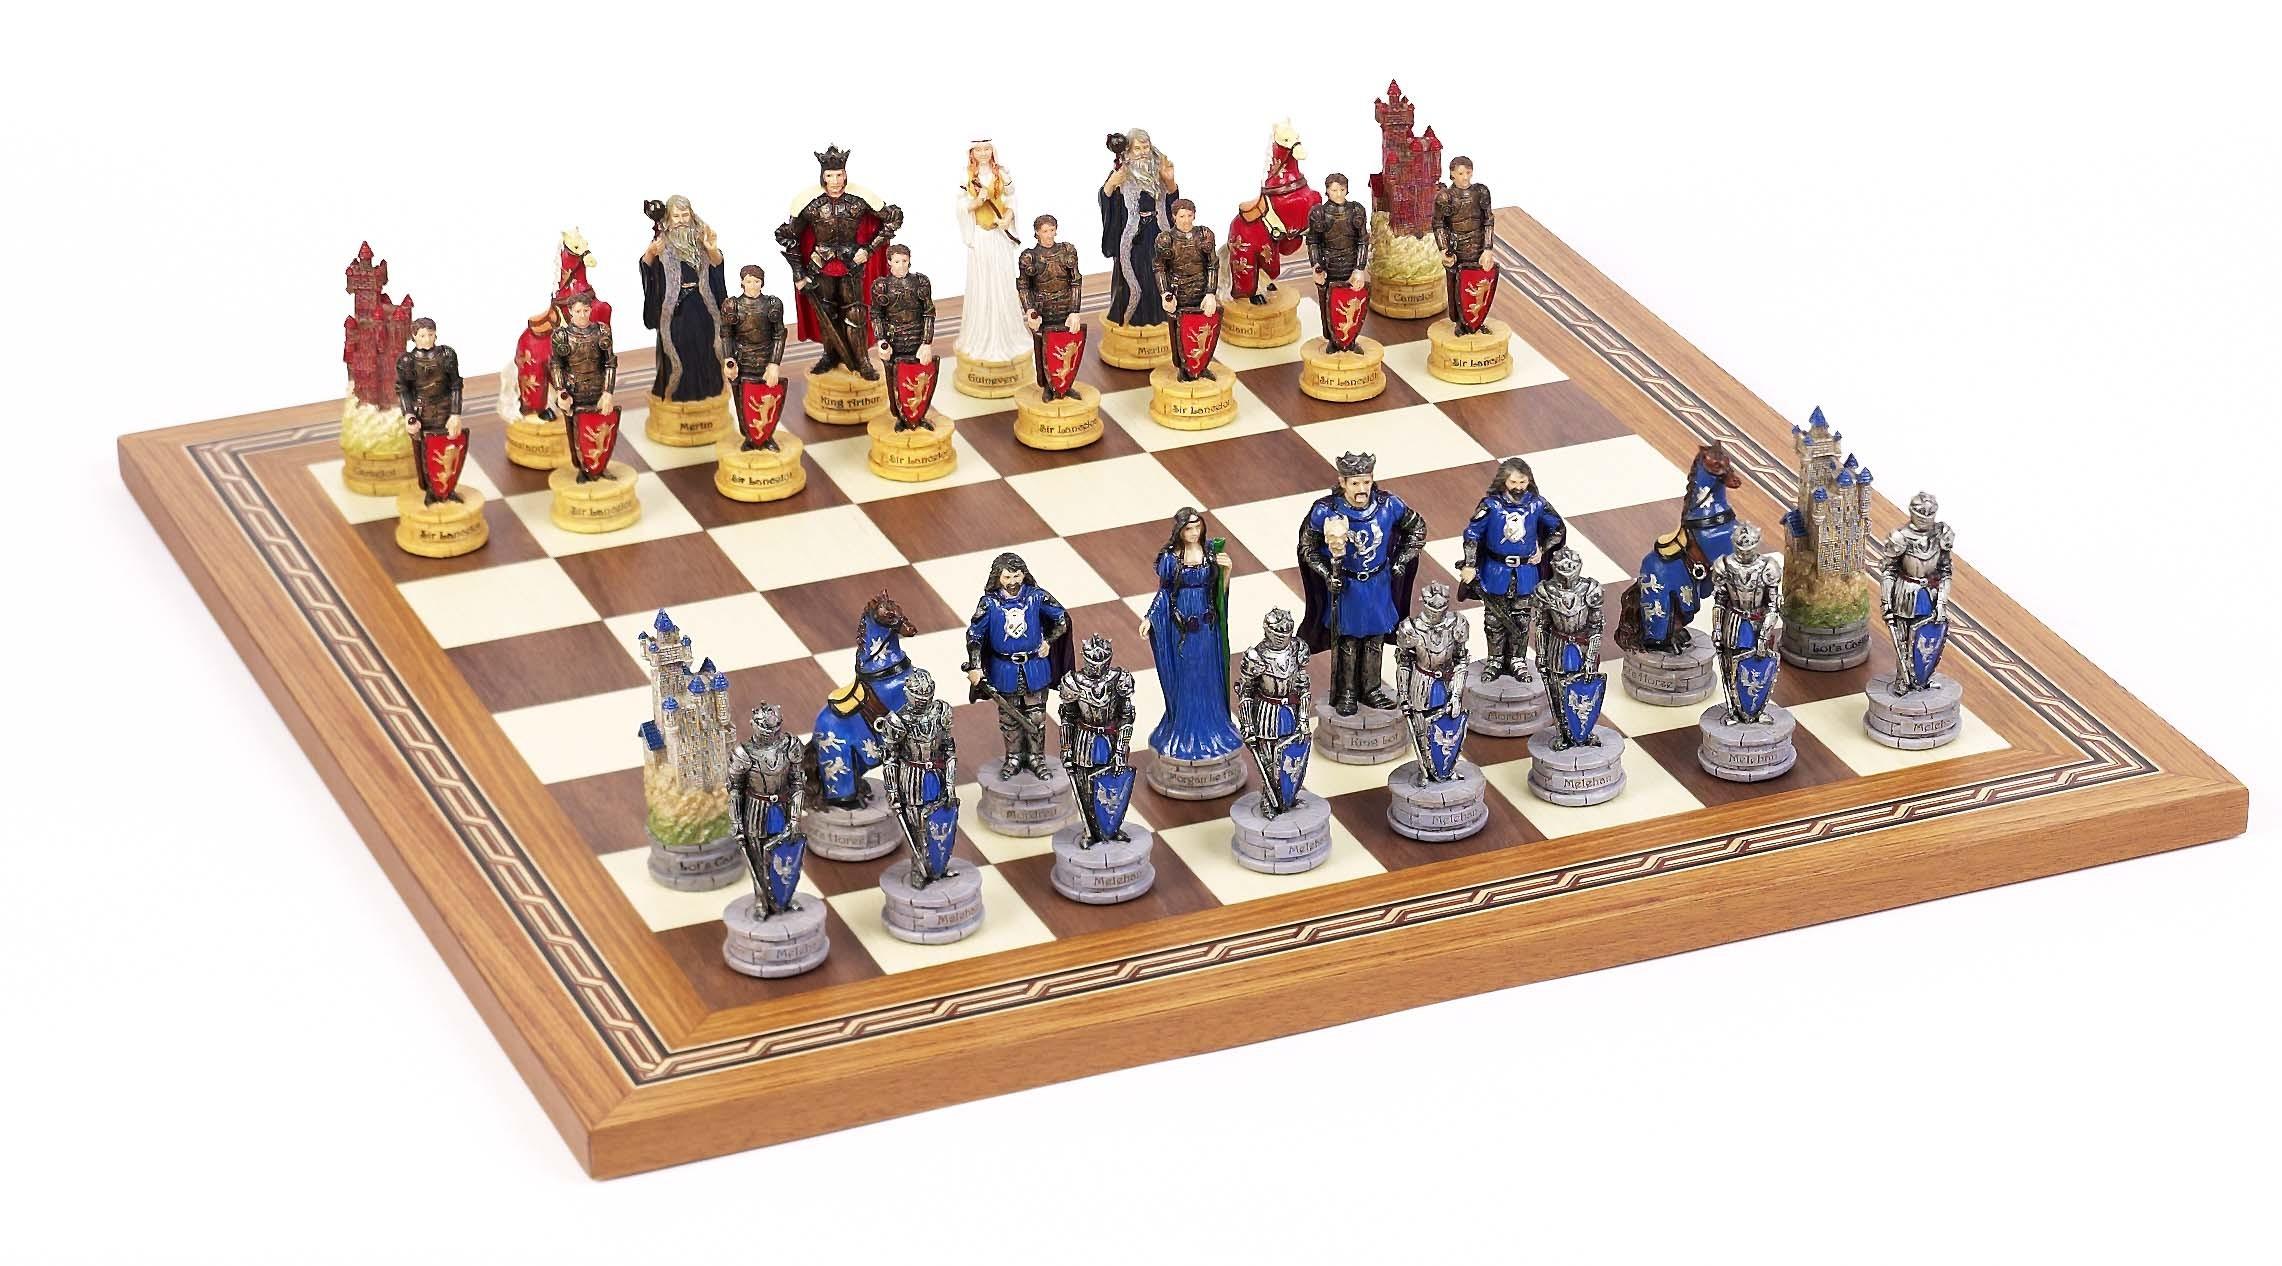 King Arthur Chessmen & Mosaic Board